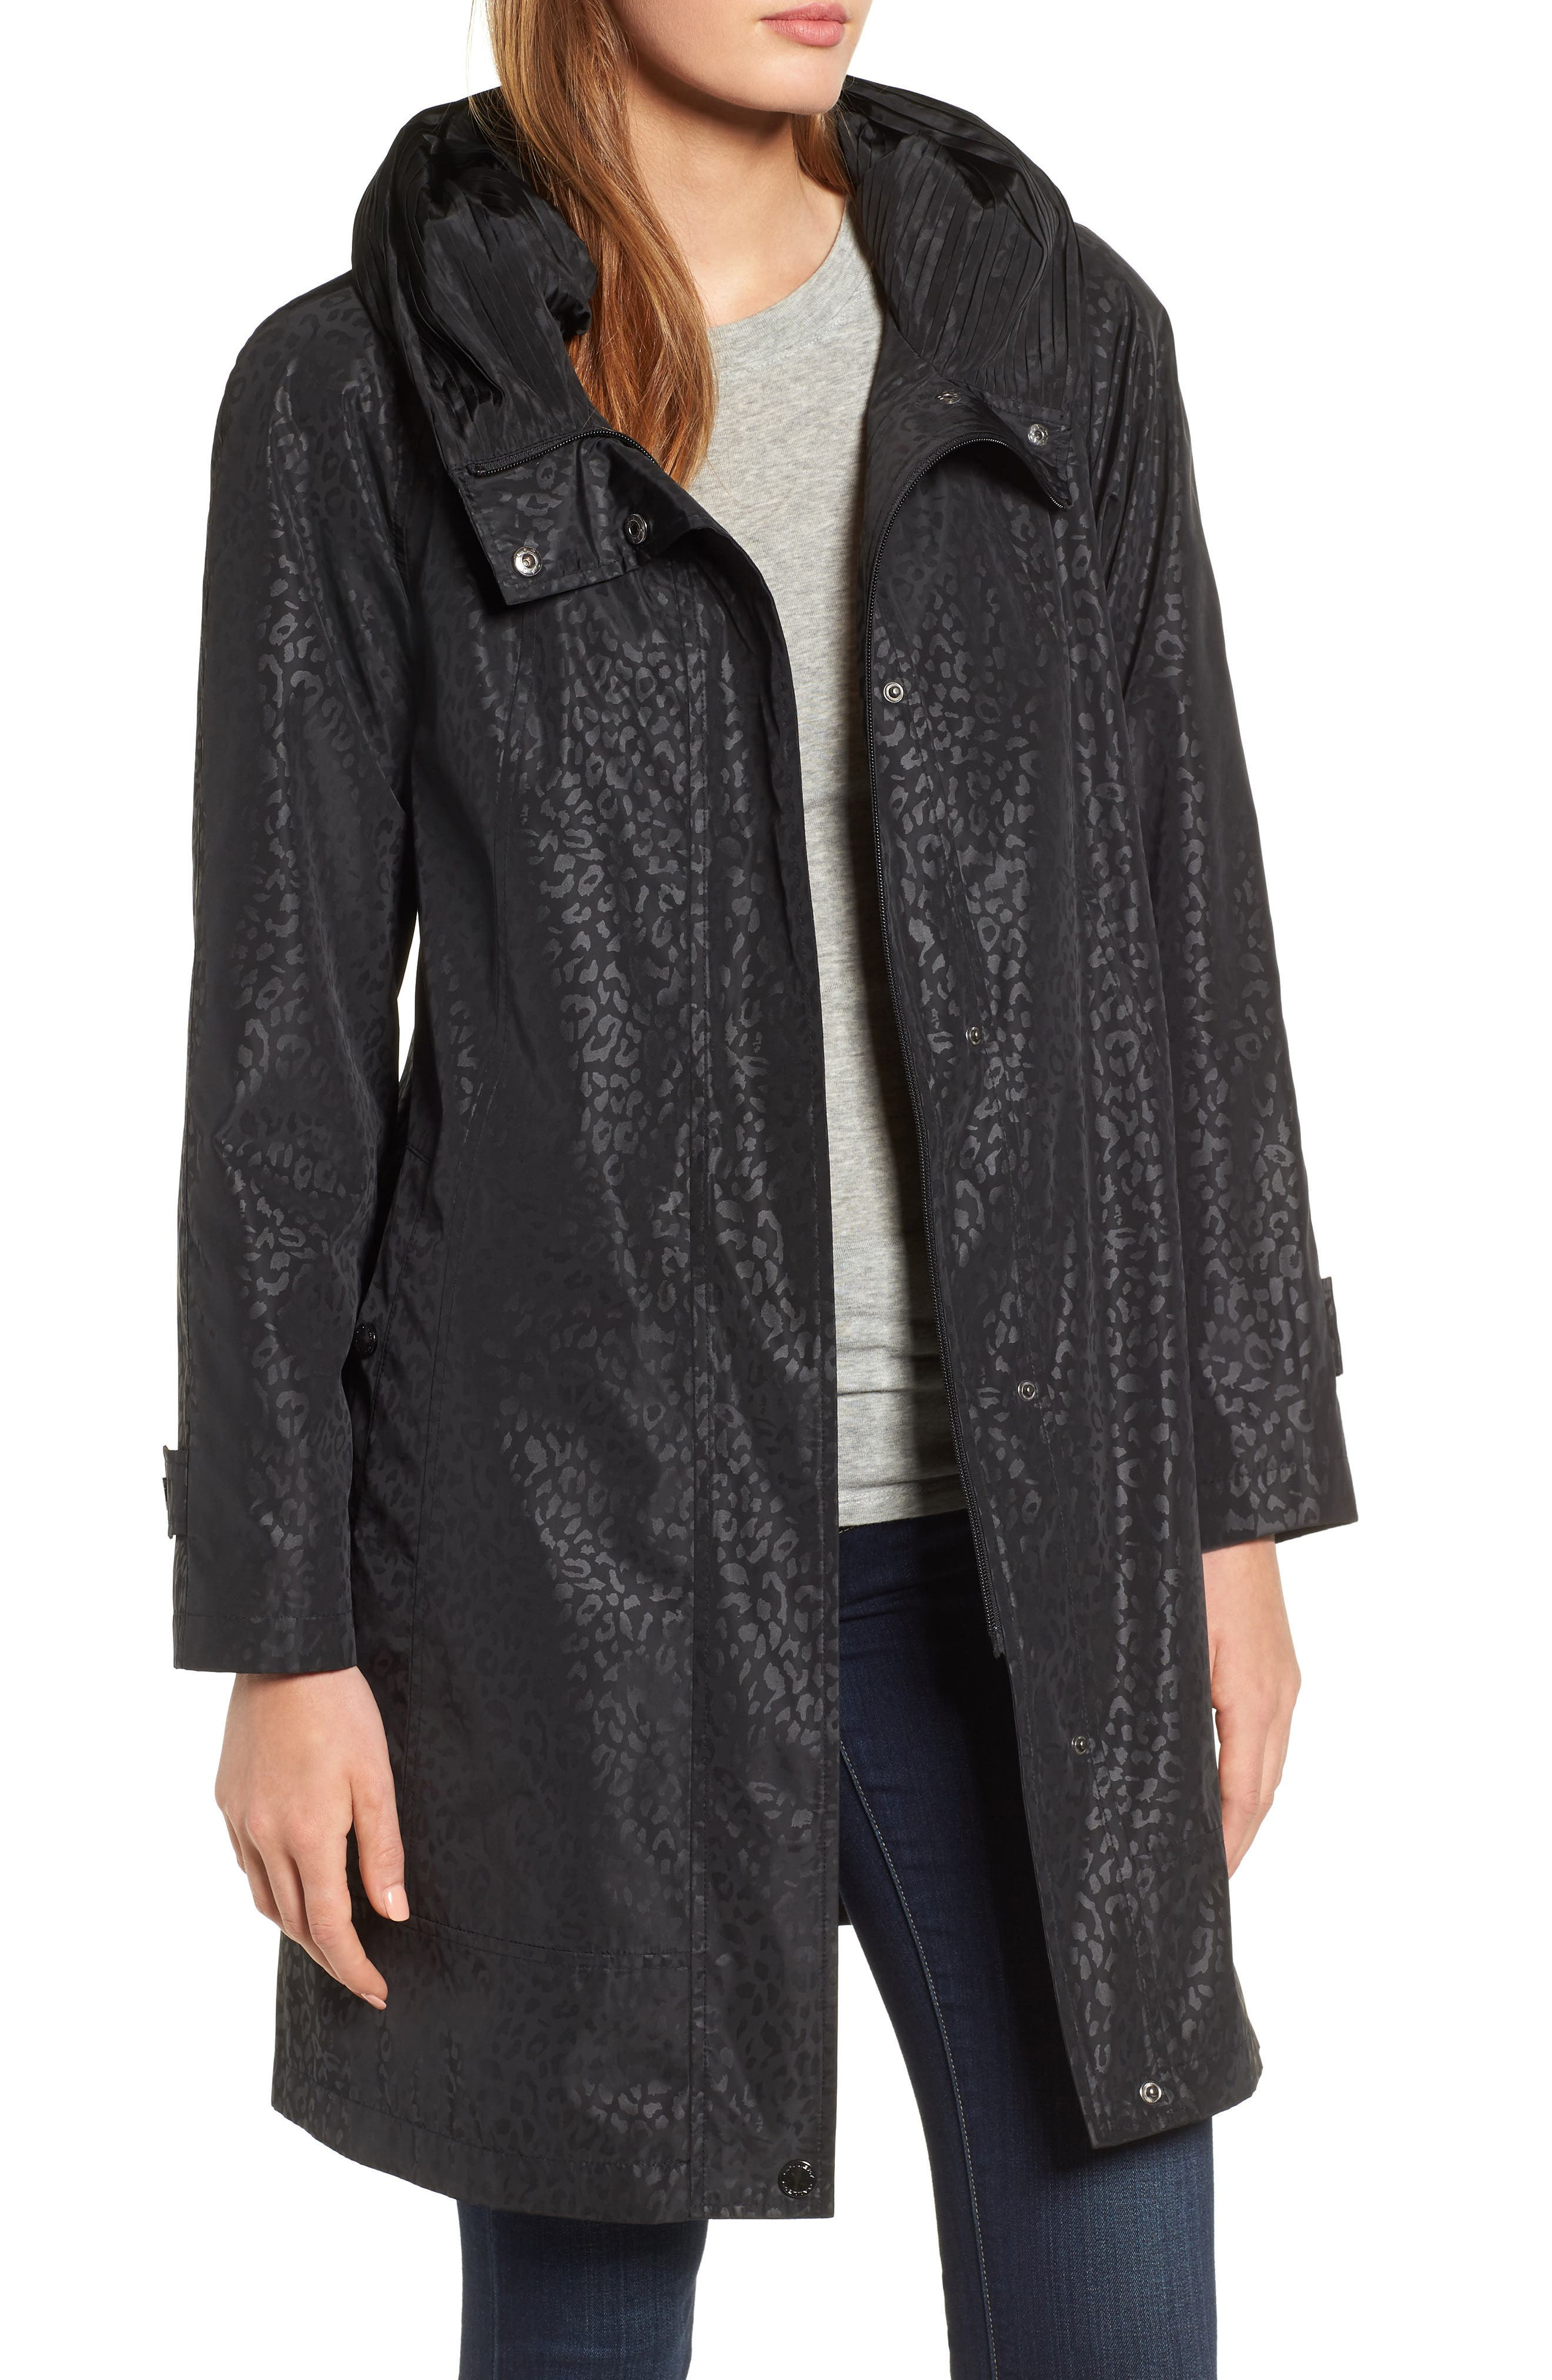 GALLERY Pleated Collar Raincoat, Main, color, 200